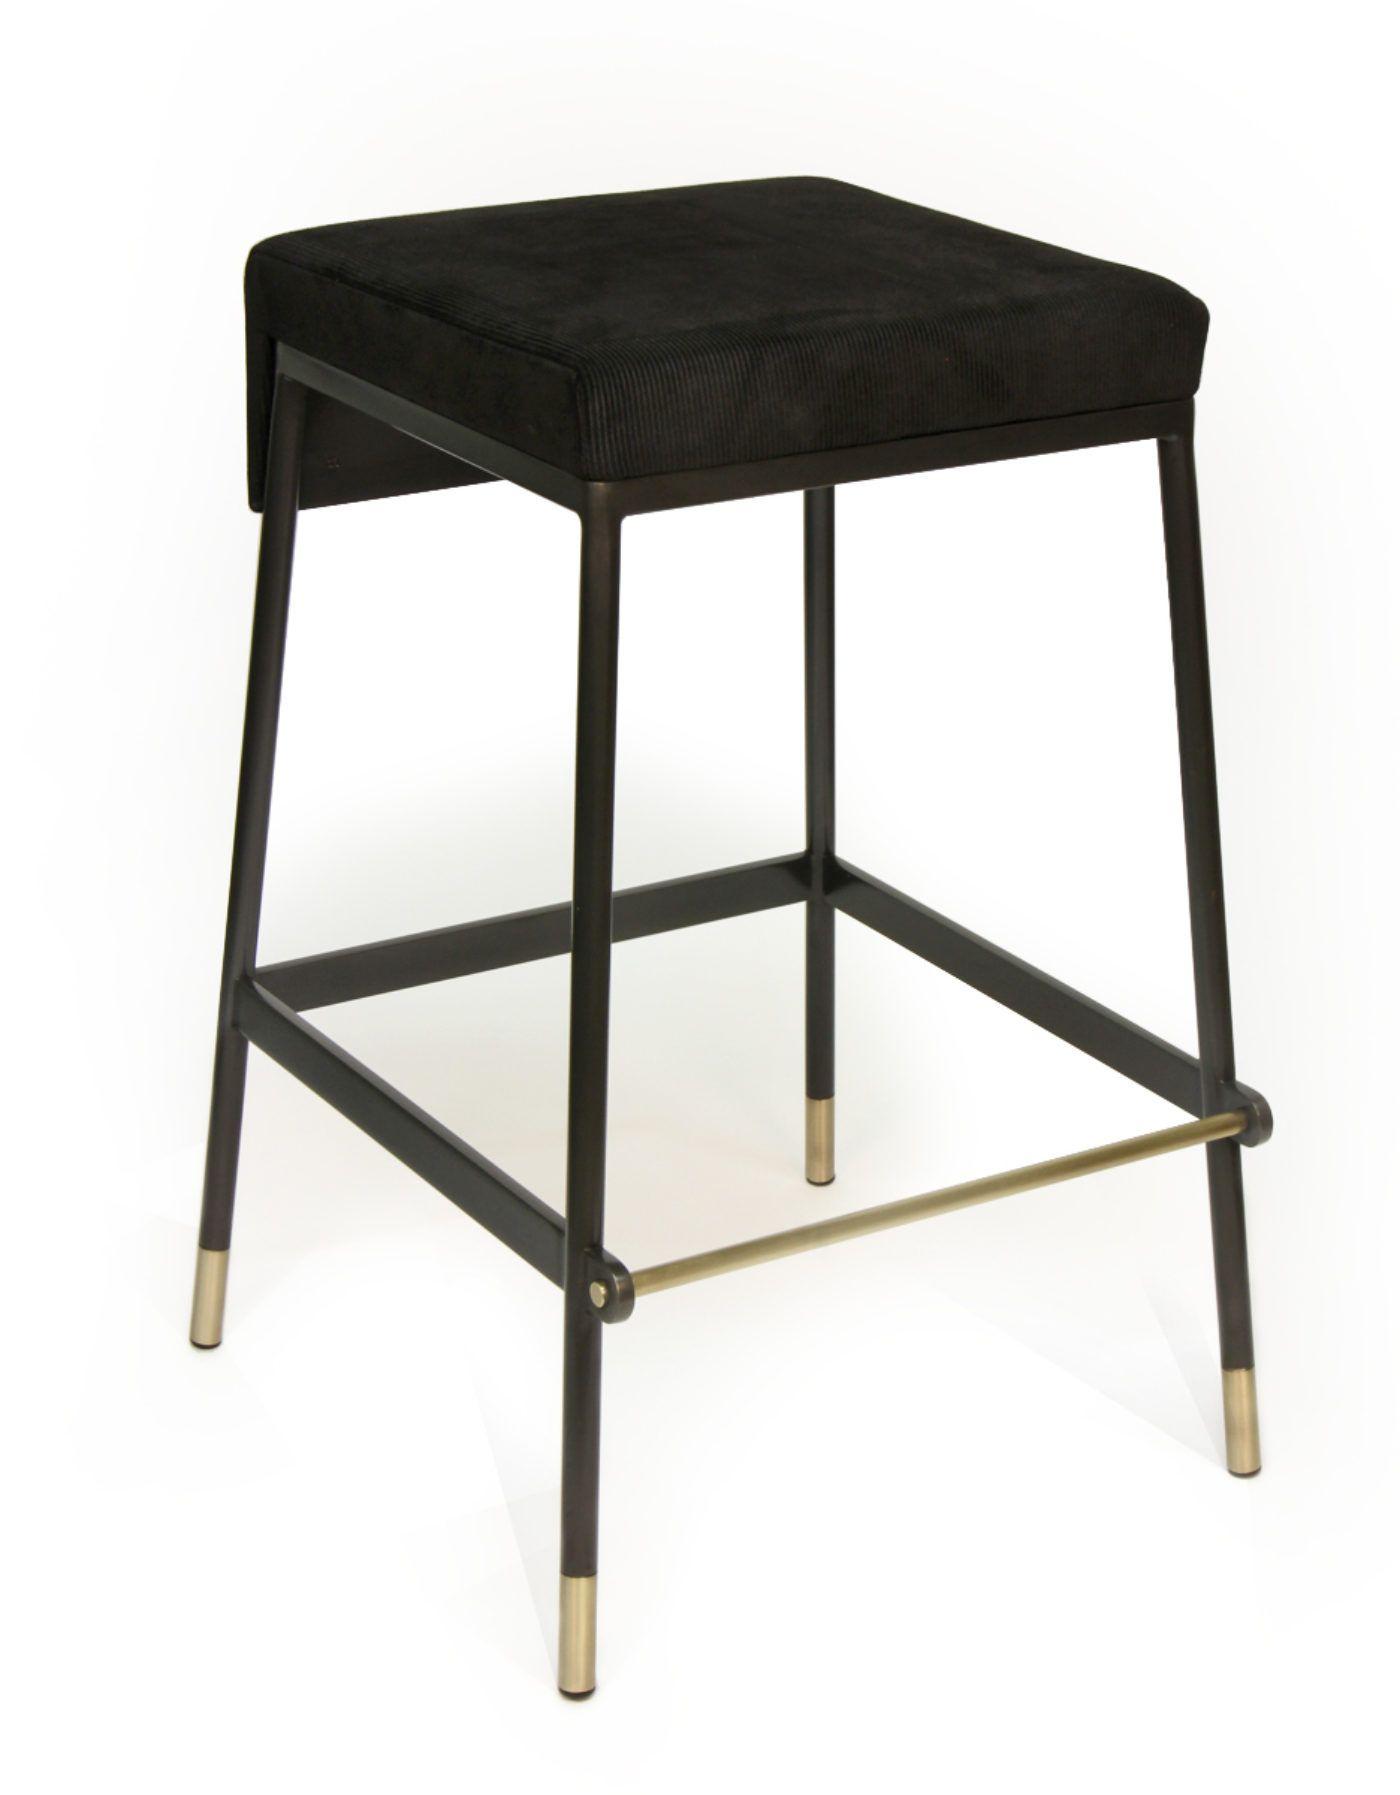 Admirable Douglas Jennings Collection Henry Bar Stool Furniture Machost Co Dining Chair Design Ideas Machostcouk